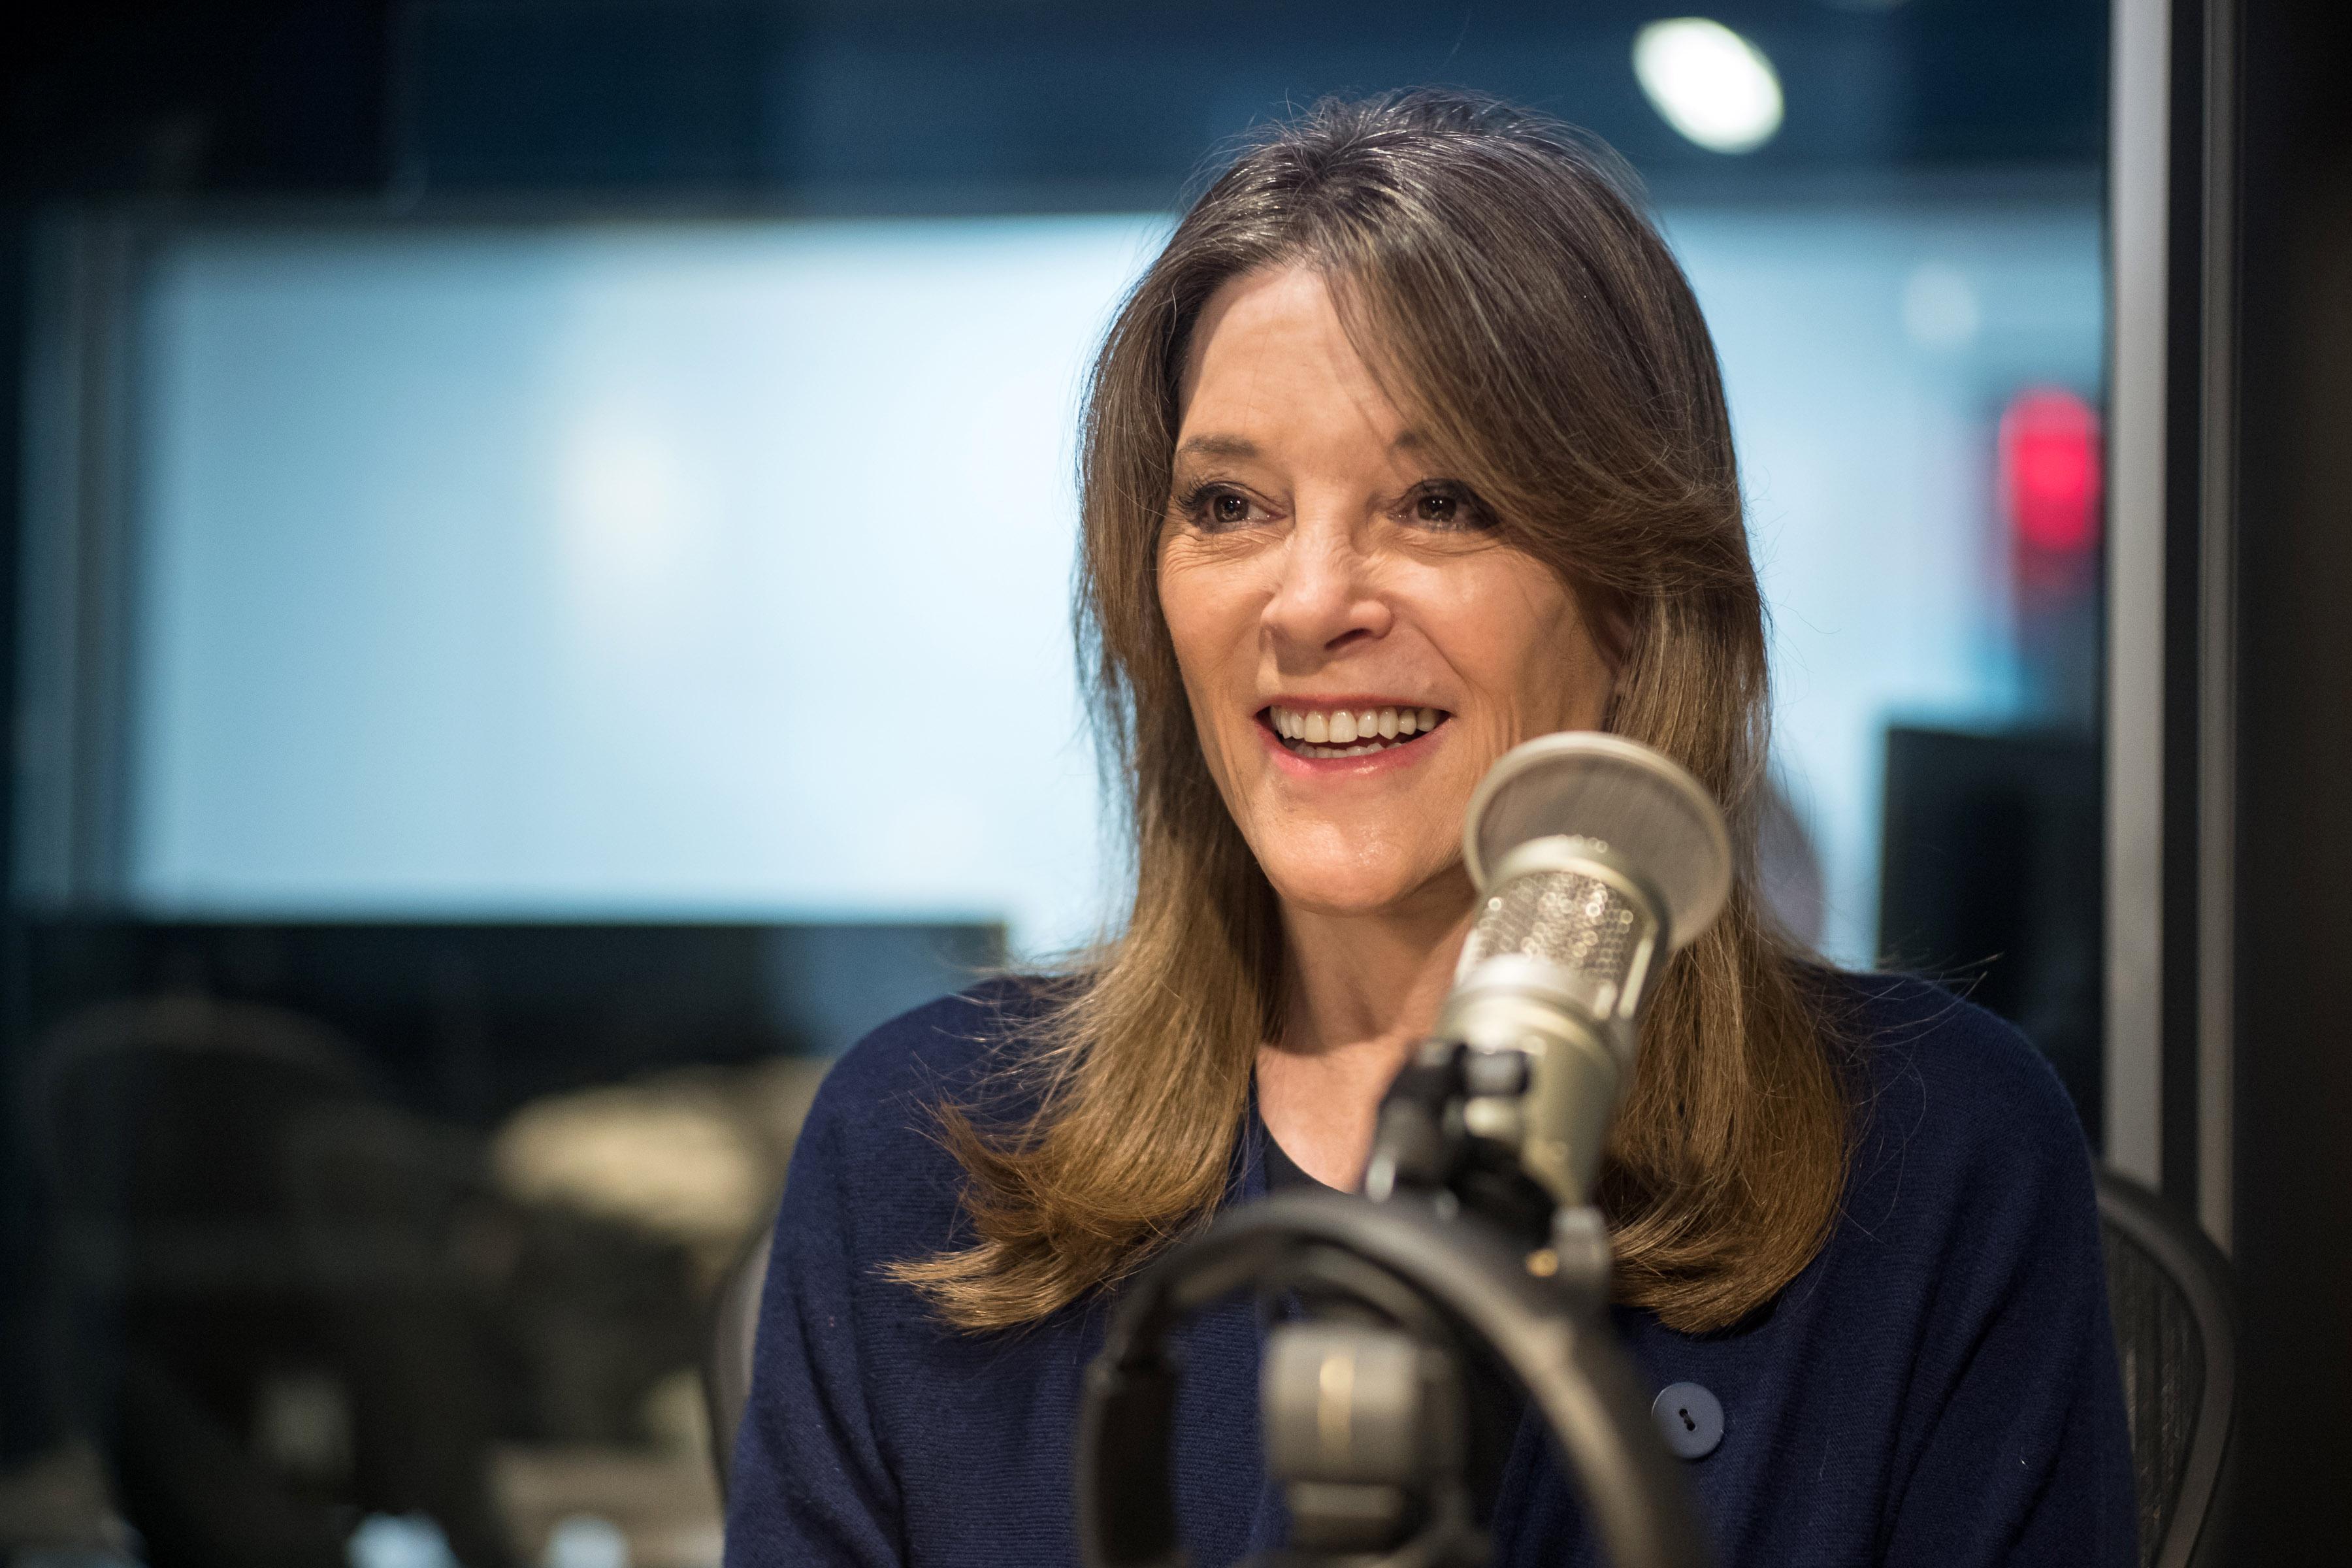 Celebrities Visit SiriusXM - March 7, 2019